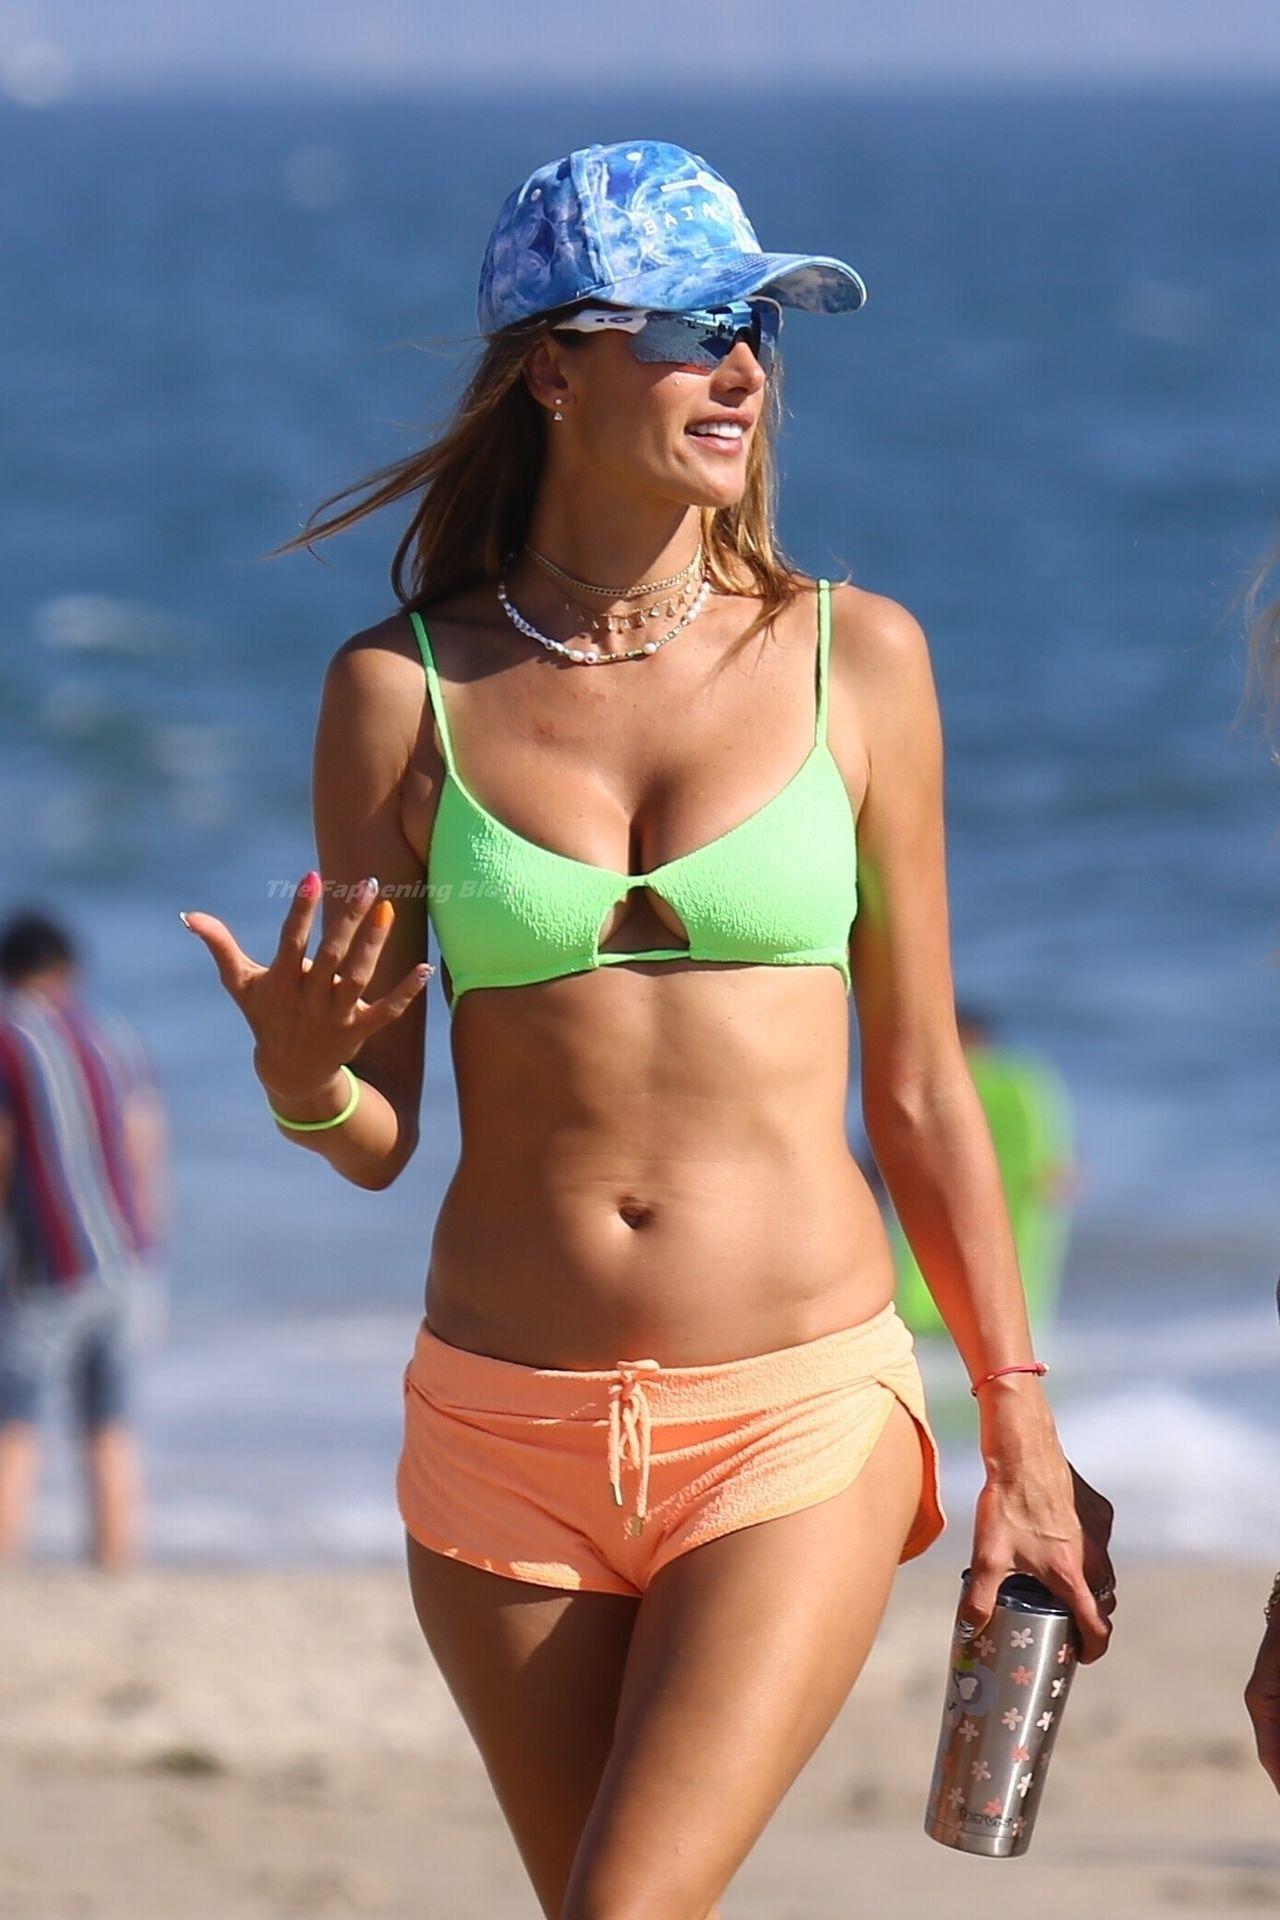 Alessandra-Ambrosio-Sexy-The-Fappening-Blog-641.jpg